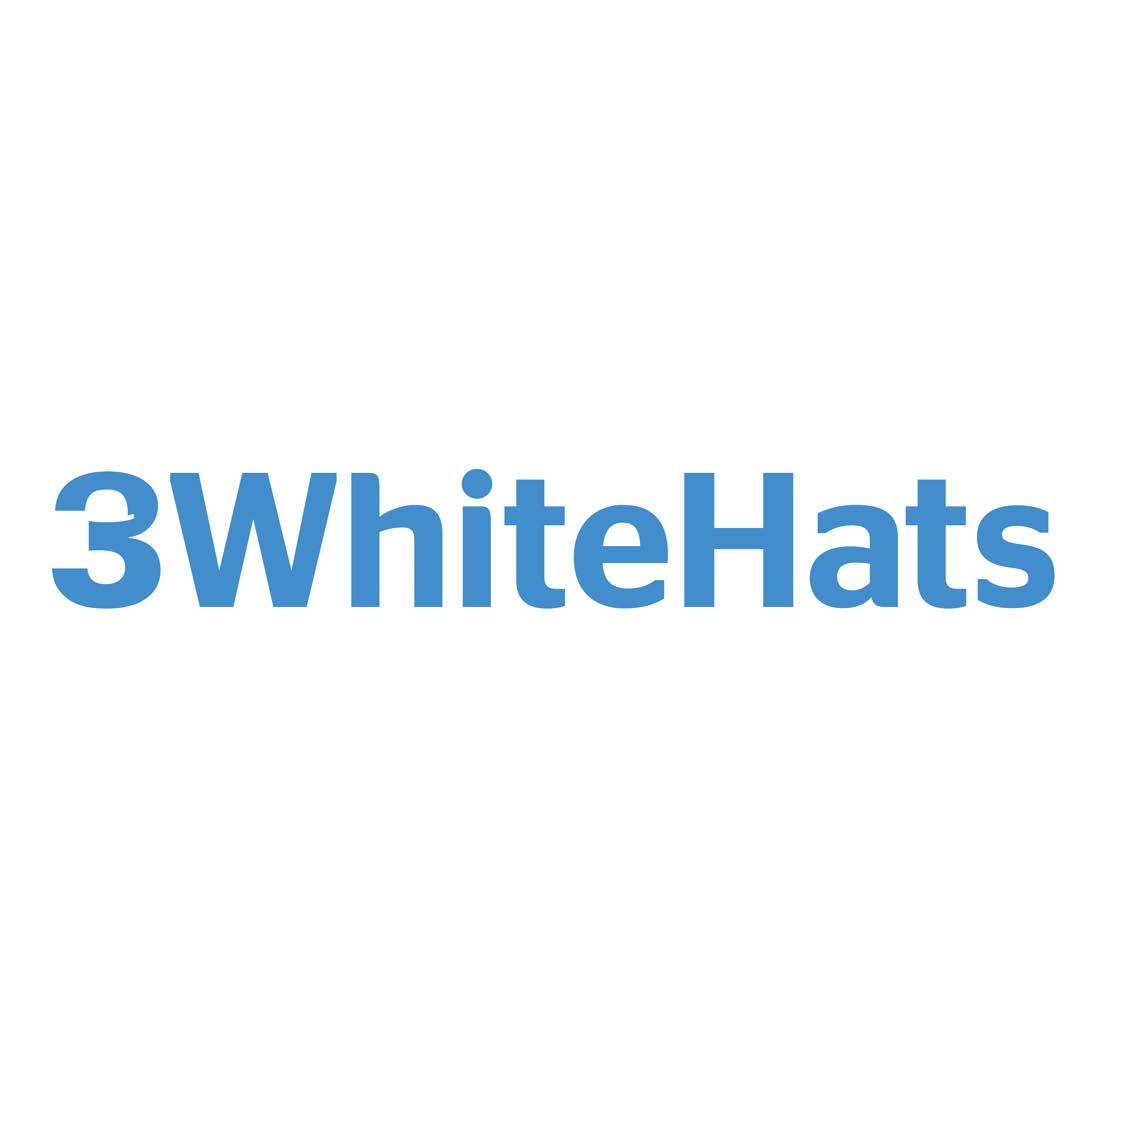 3white